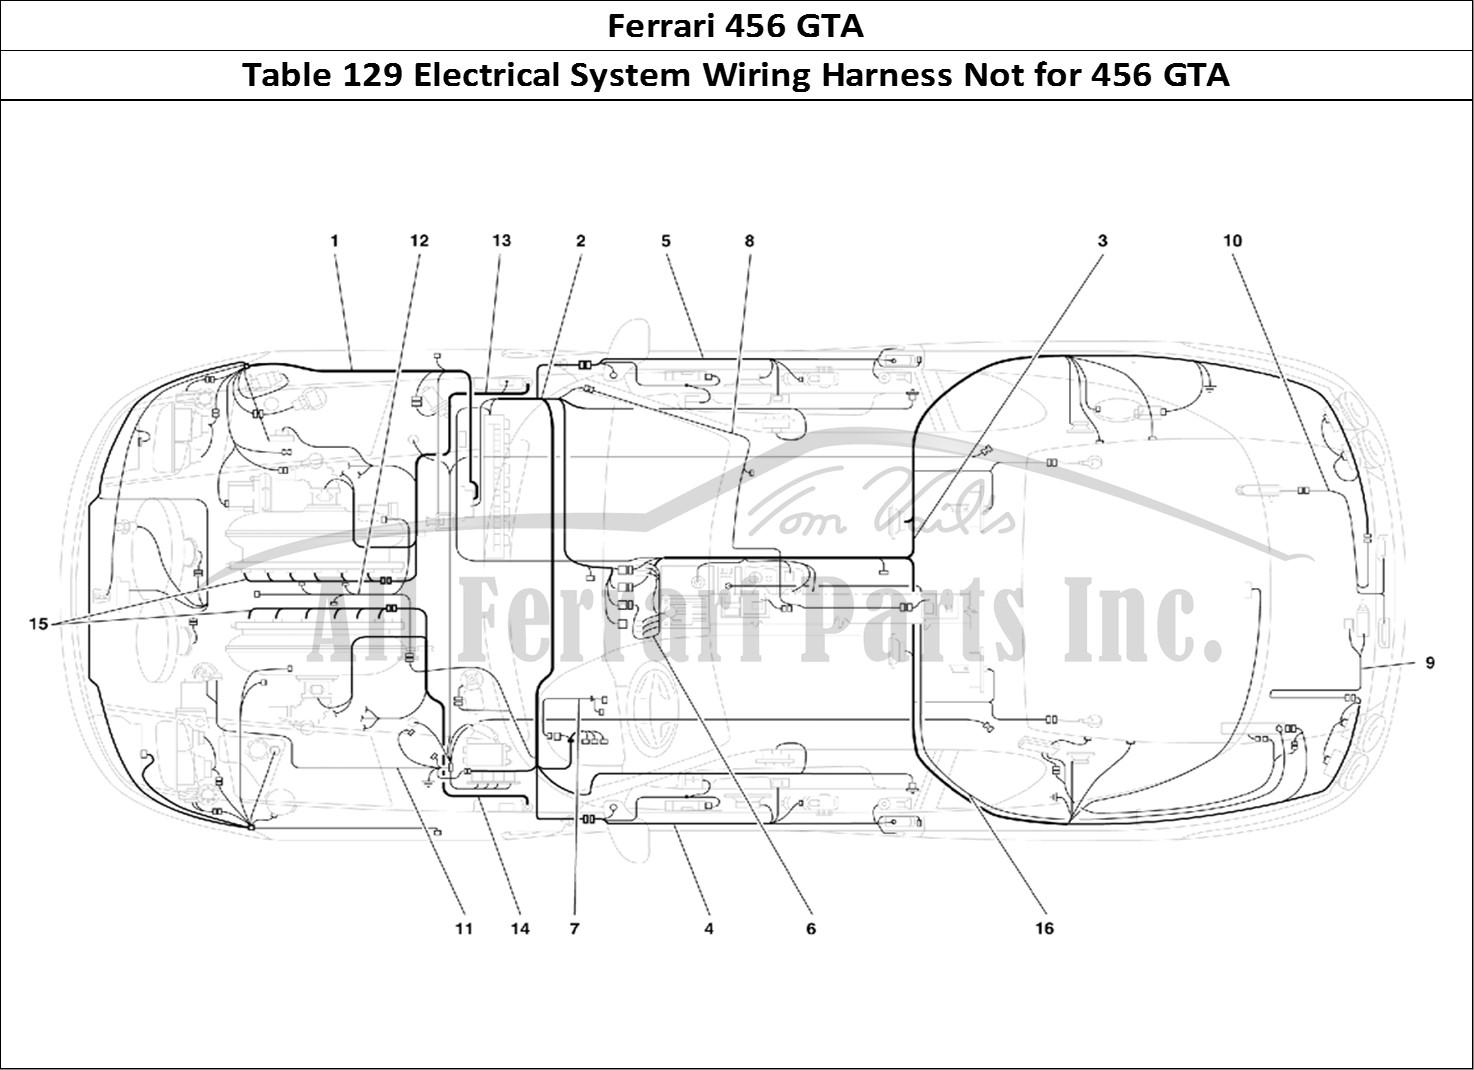 Buy Original Ferrari 456 Gta 129 Electrical System Wiring